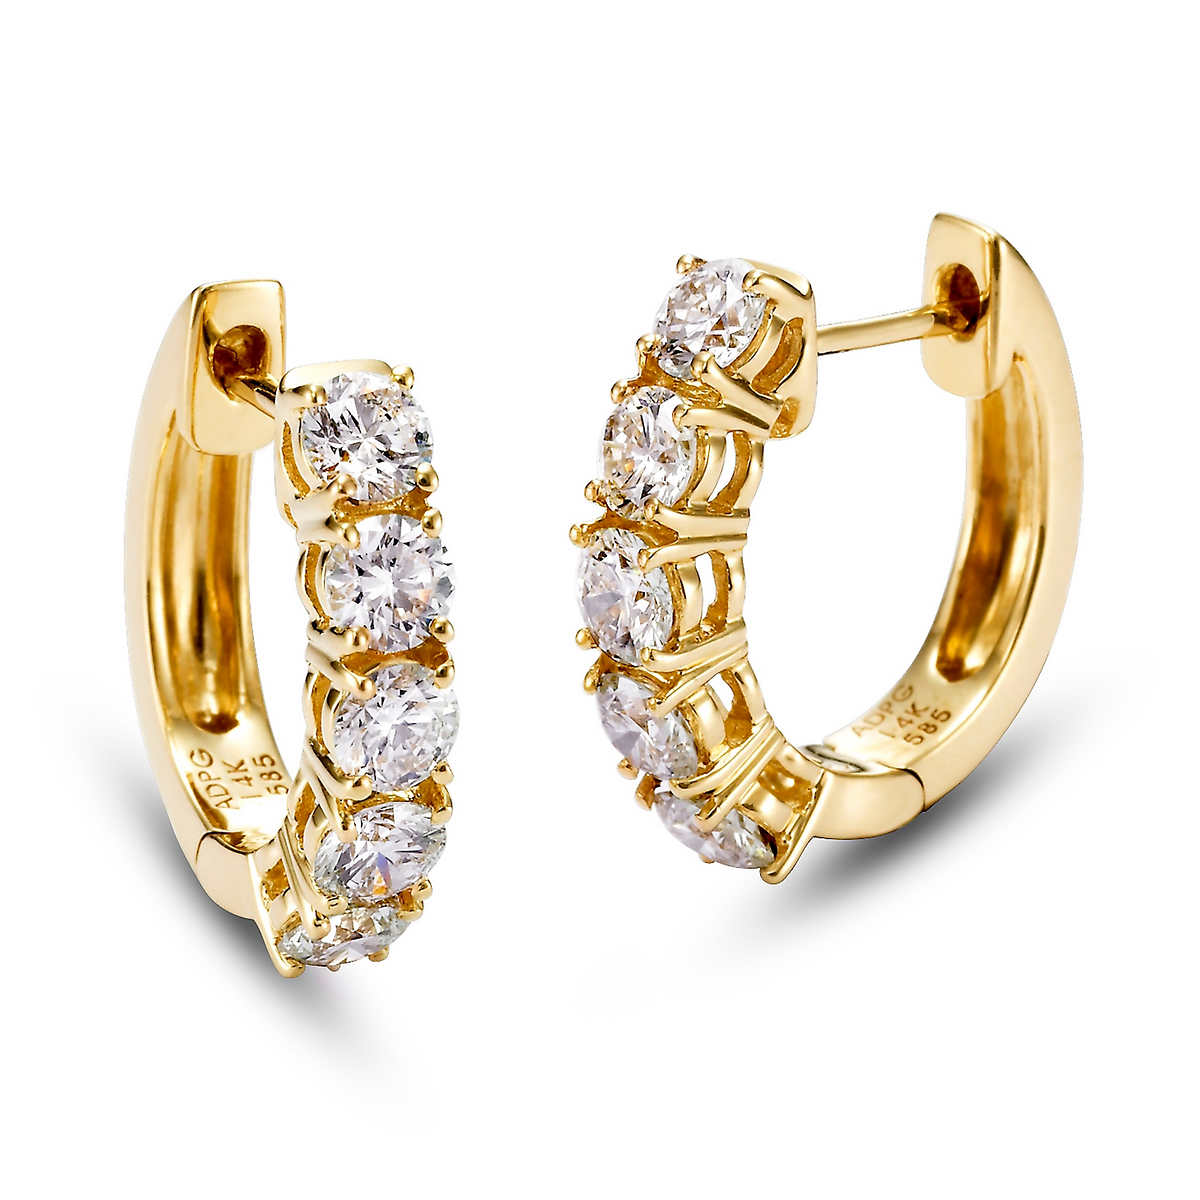 Round Brilliant 145 Ctw Vs2 Clarity, I Color Diamond 14kt Yellow Gold  5stone